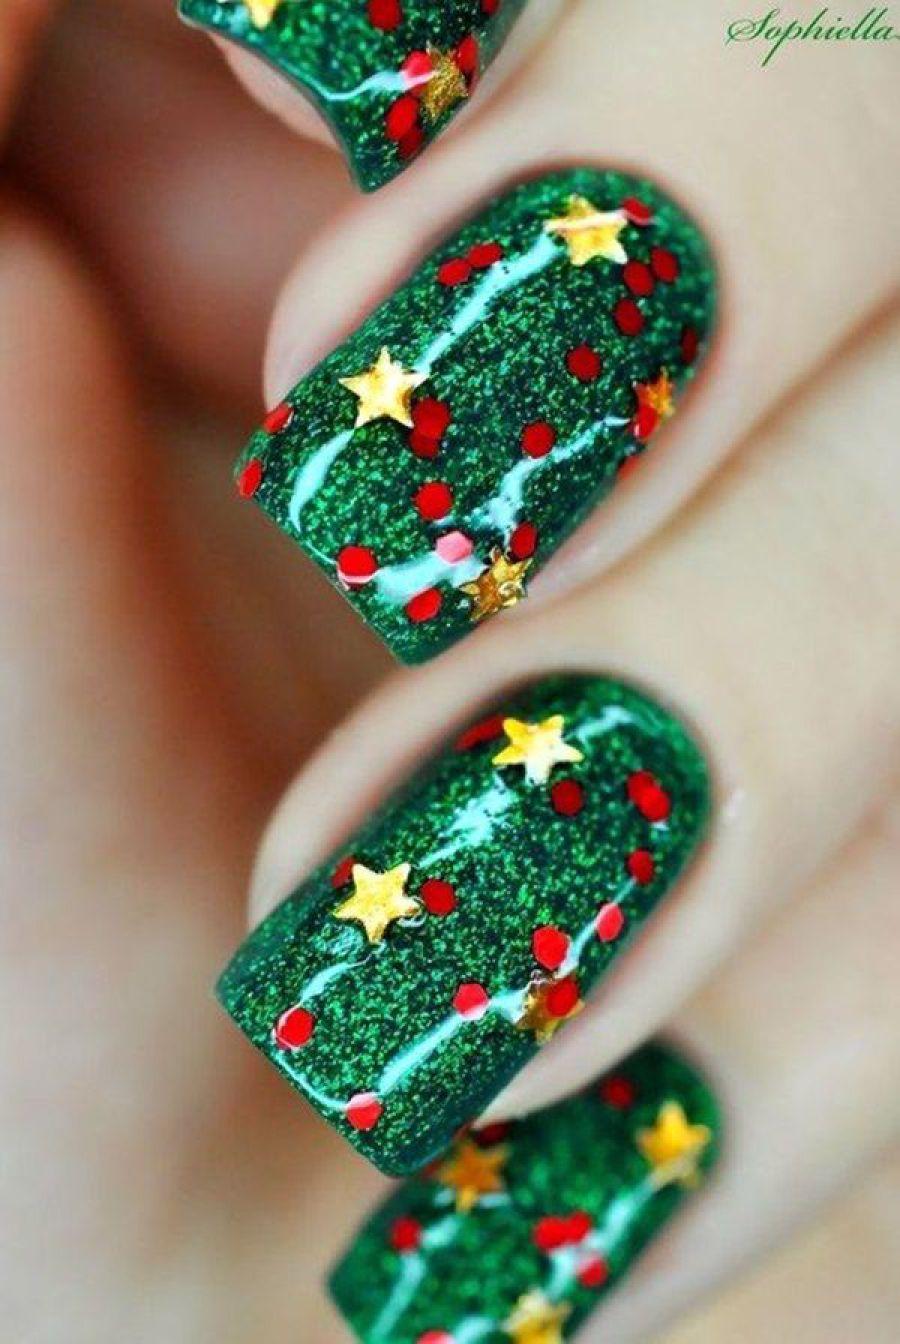 Christmas Nail Art Green Glitter Base Gold Stars And Red Lights